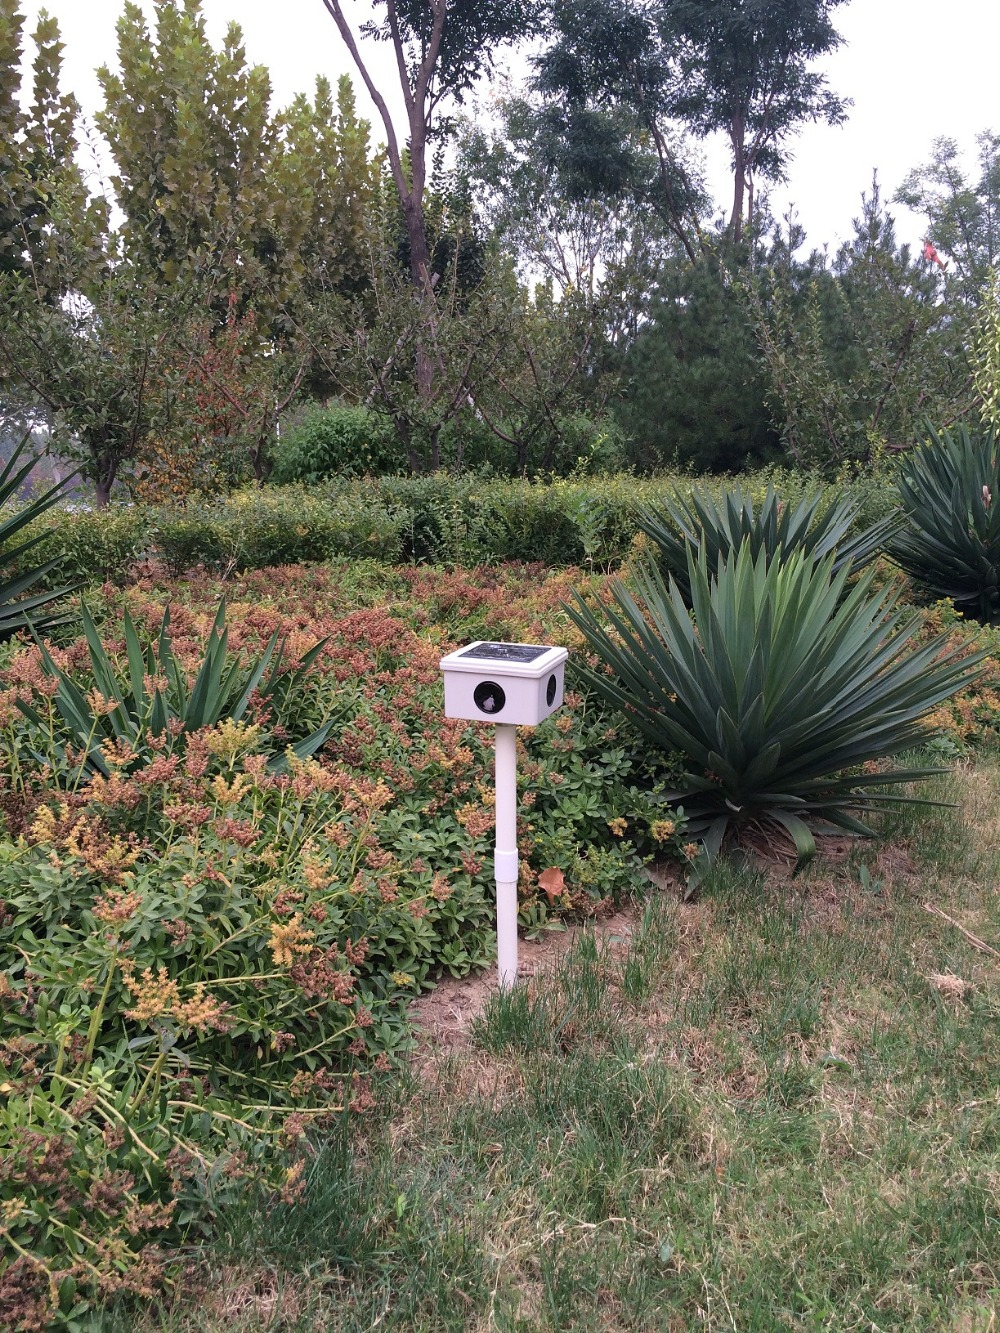 US $56 97 20% OFF|Solar Power Bird Repeller Repellent Deterrent Pigeon  Scarer Strong Ultrasonic Sound Bird Scare Pest Control For Garden  Orchard-in